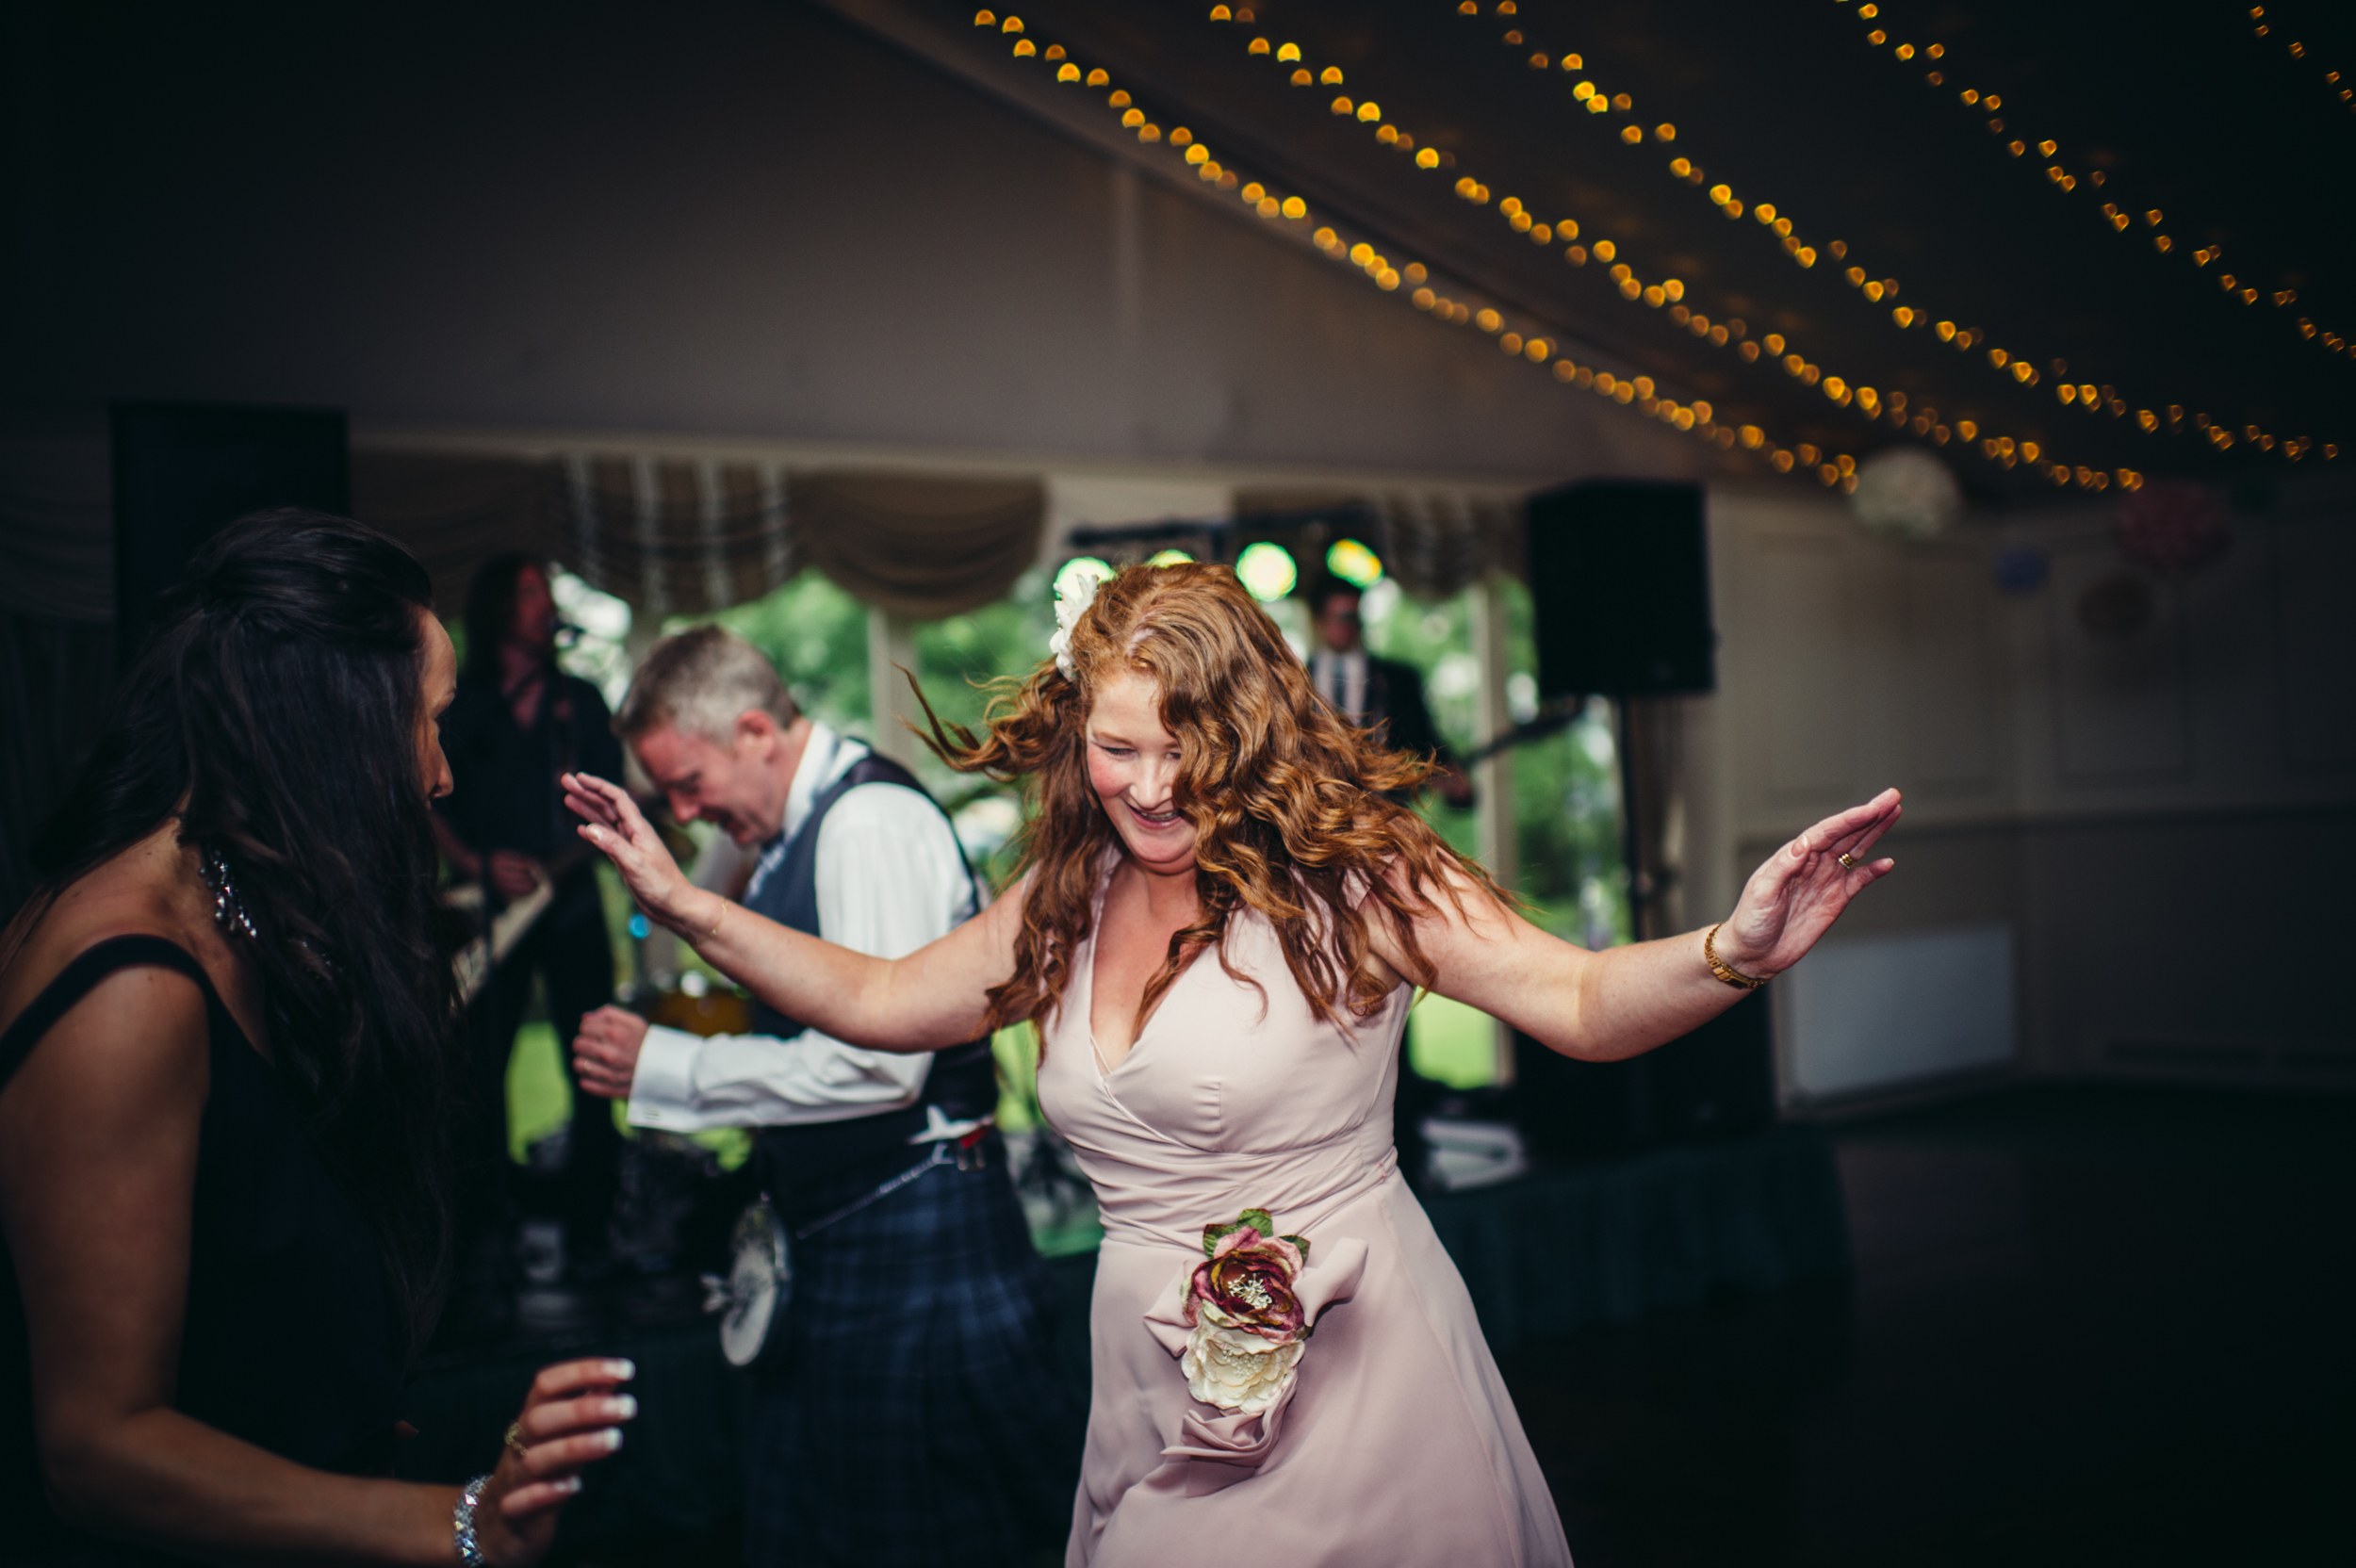 0190-lisa-devine-alternative-creative-wedding-photography-glasgow-edinburgh.JPG